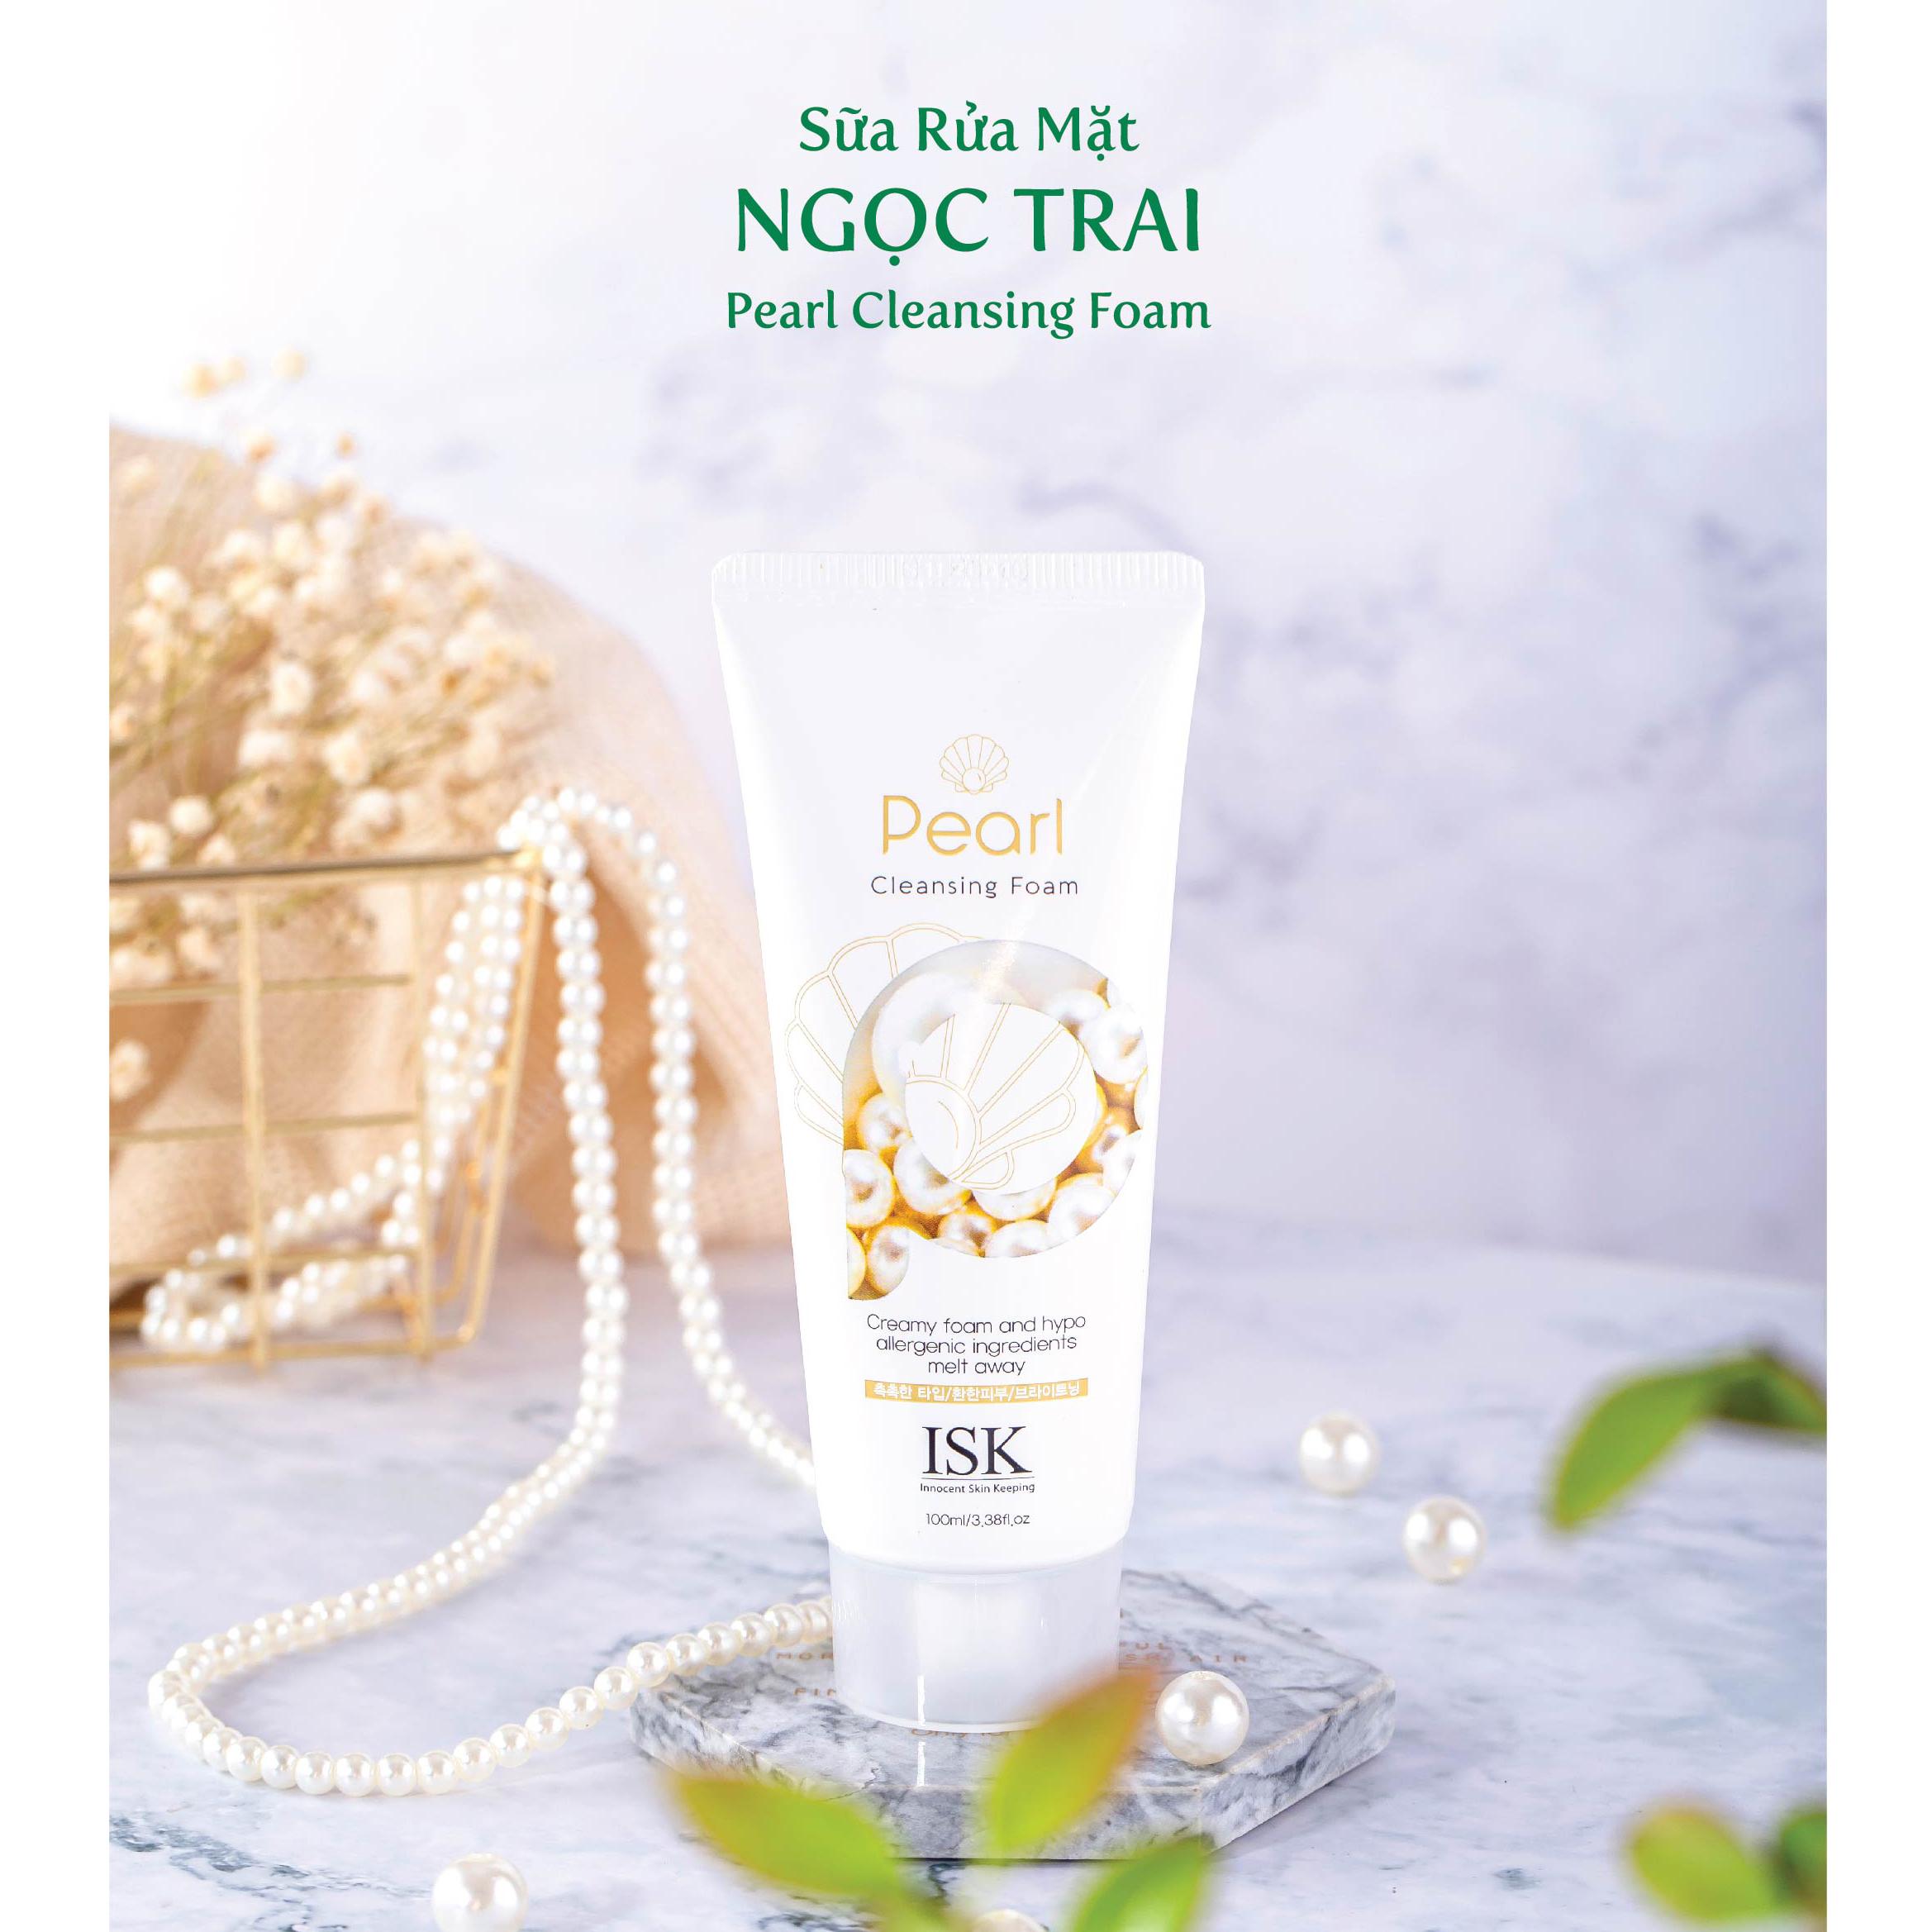 Sữa rửa mặt Ngọc Trai trắng da sạch nhờn ISK PEARL Hàn quốc 100ml